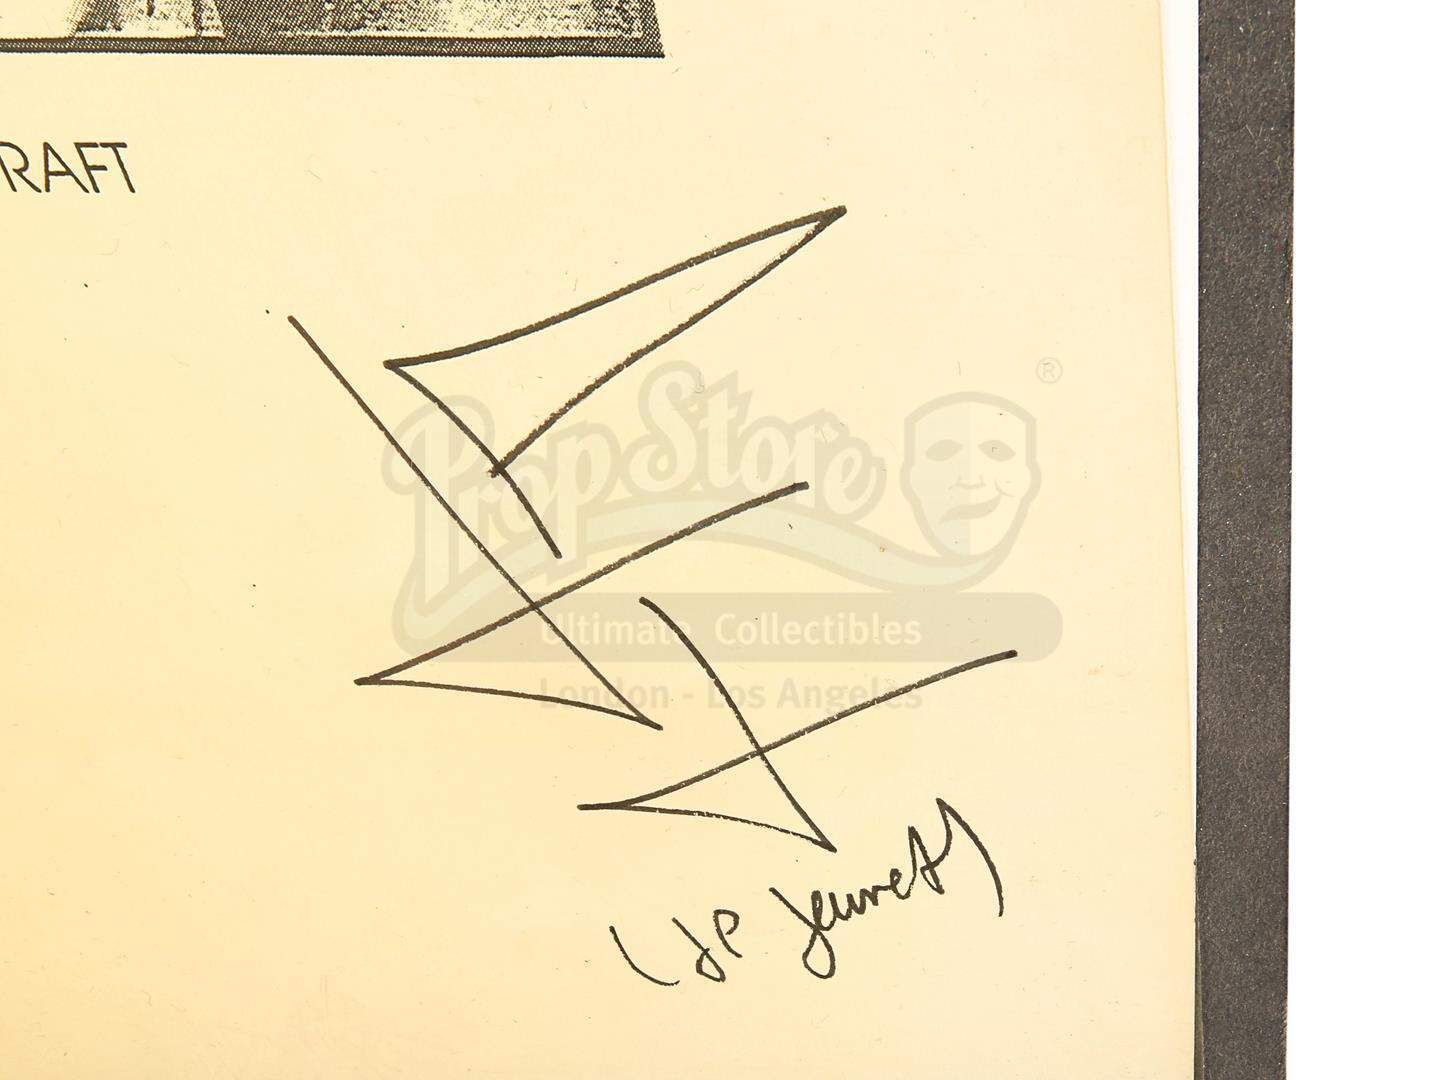 ALIEN RESURRECTION (1997) - Jean-Pierre Jeunet's Personal Storyboard Binder - Image 4 of 10